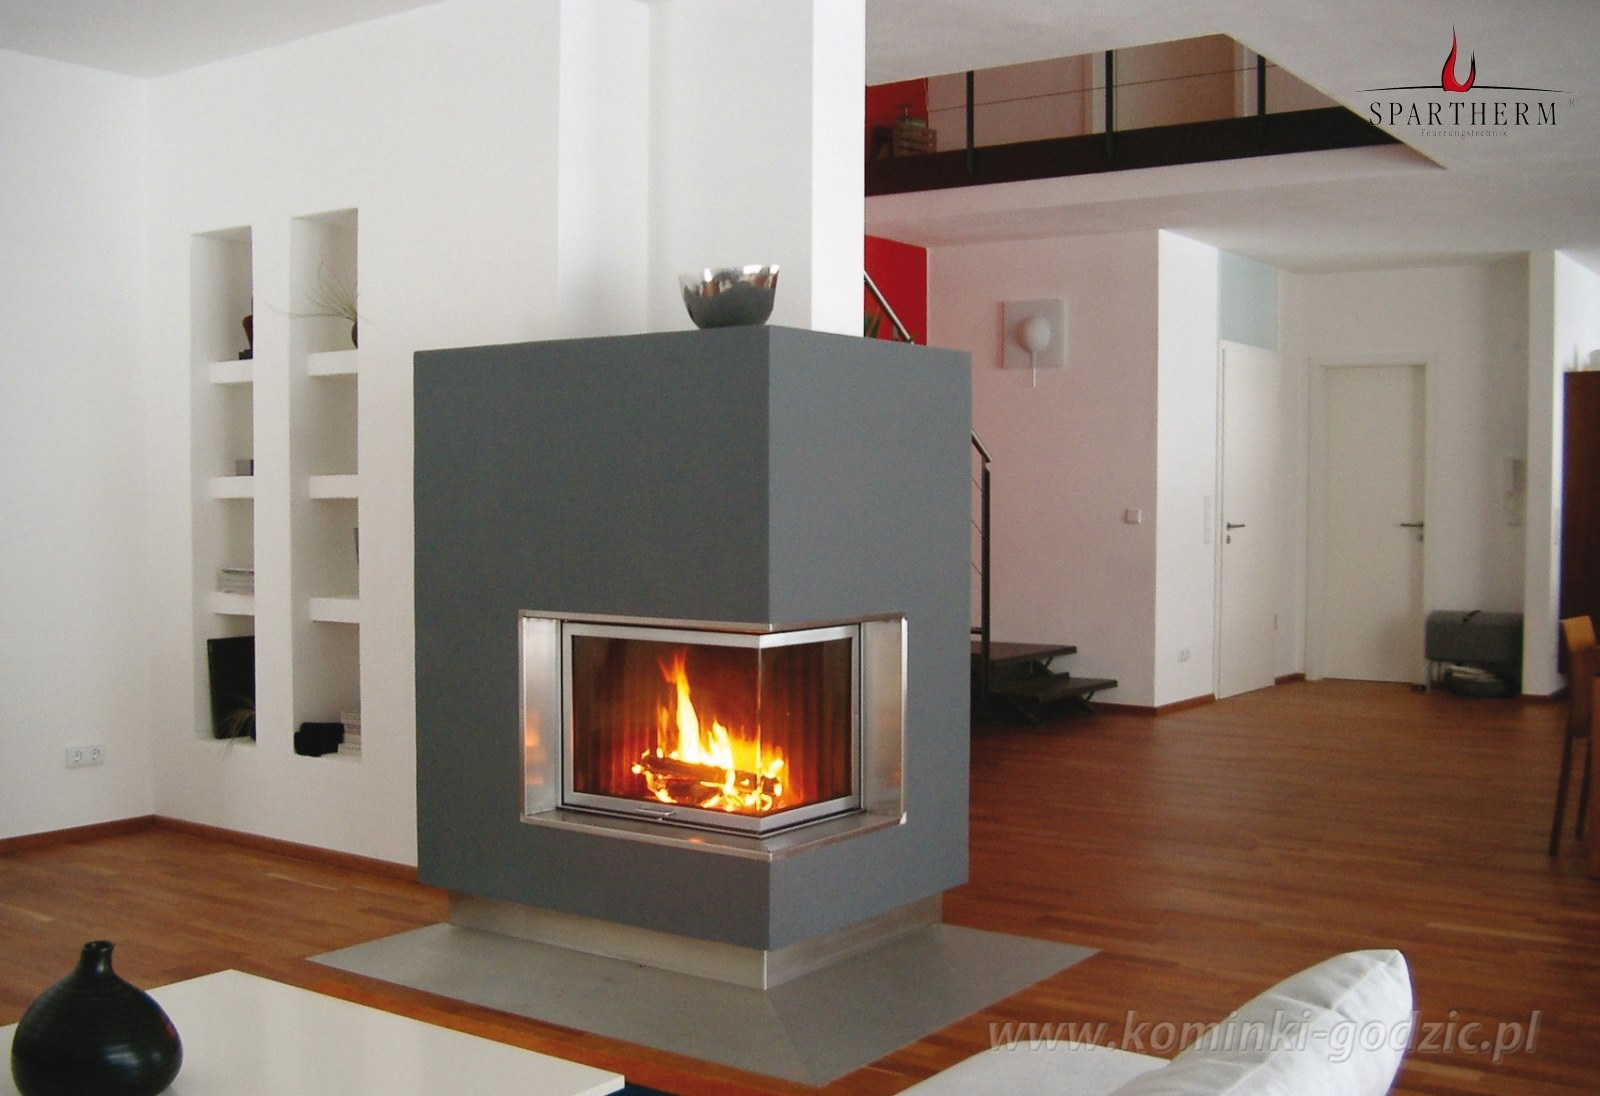 Kominki z szyb naro n galeria kominki - Decoracion de chimeneas modernas ...